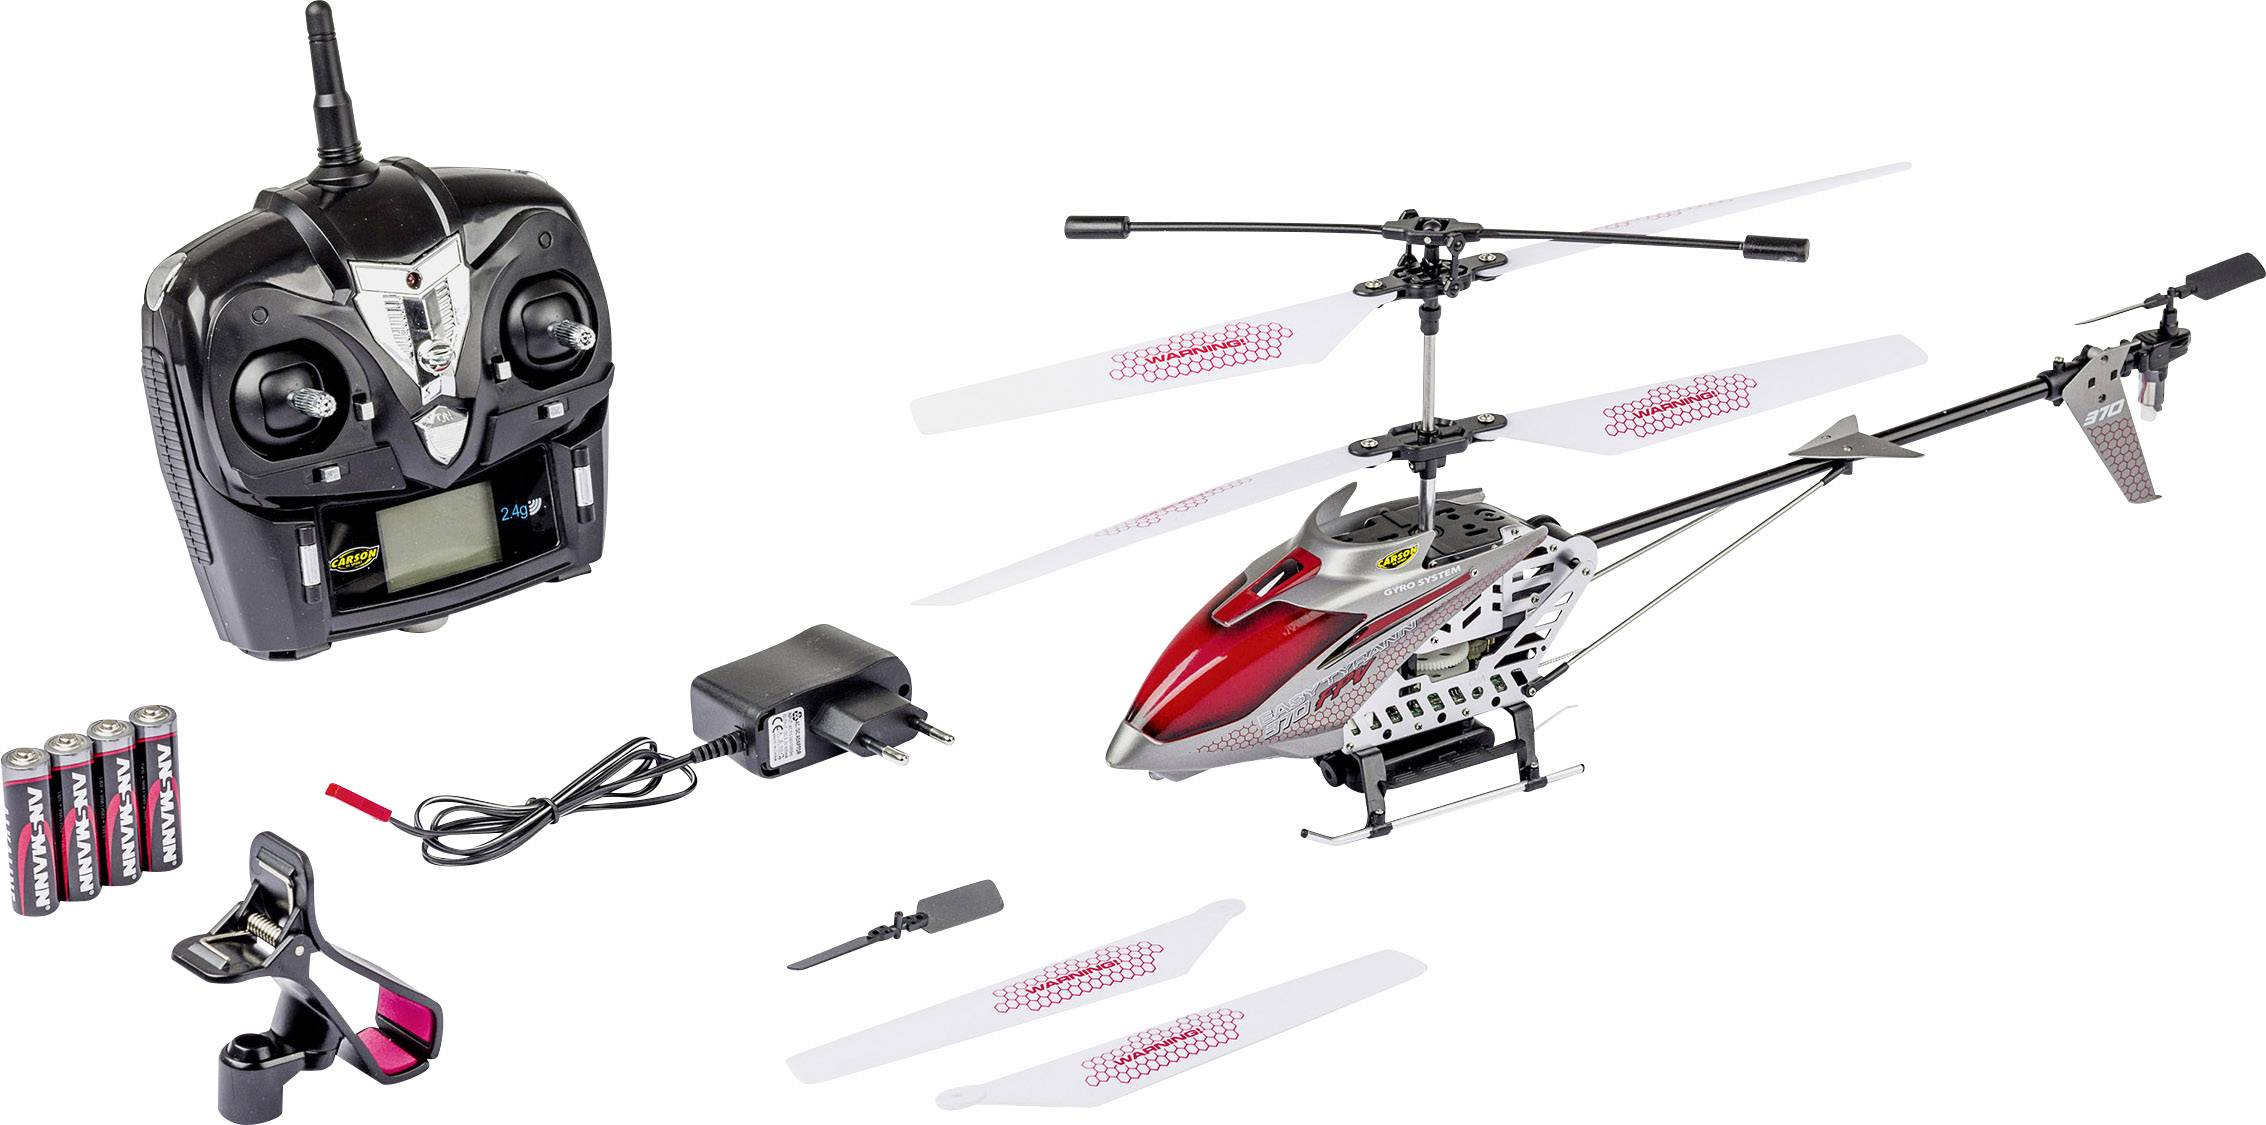 RC model vrtulníku pro začátečníky Carson RC Sport Easy Tyrann 370, RtF